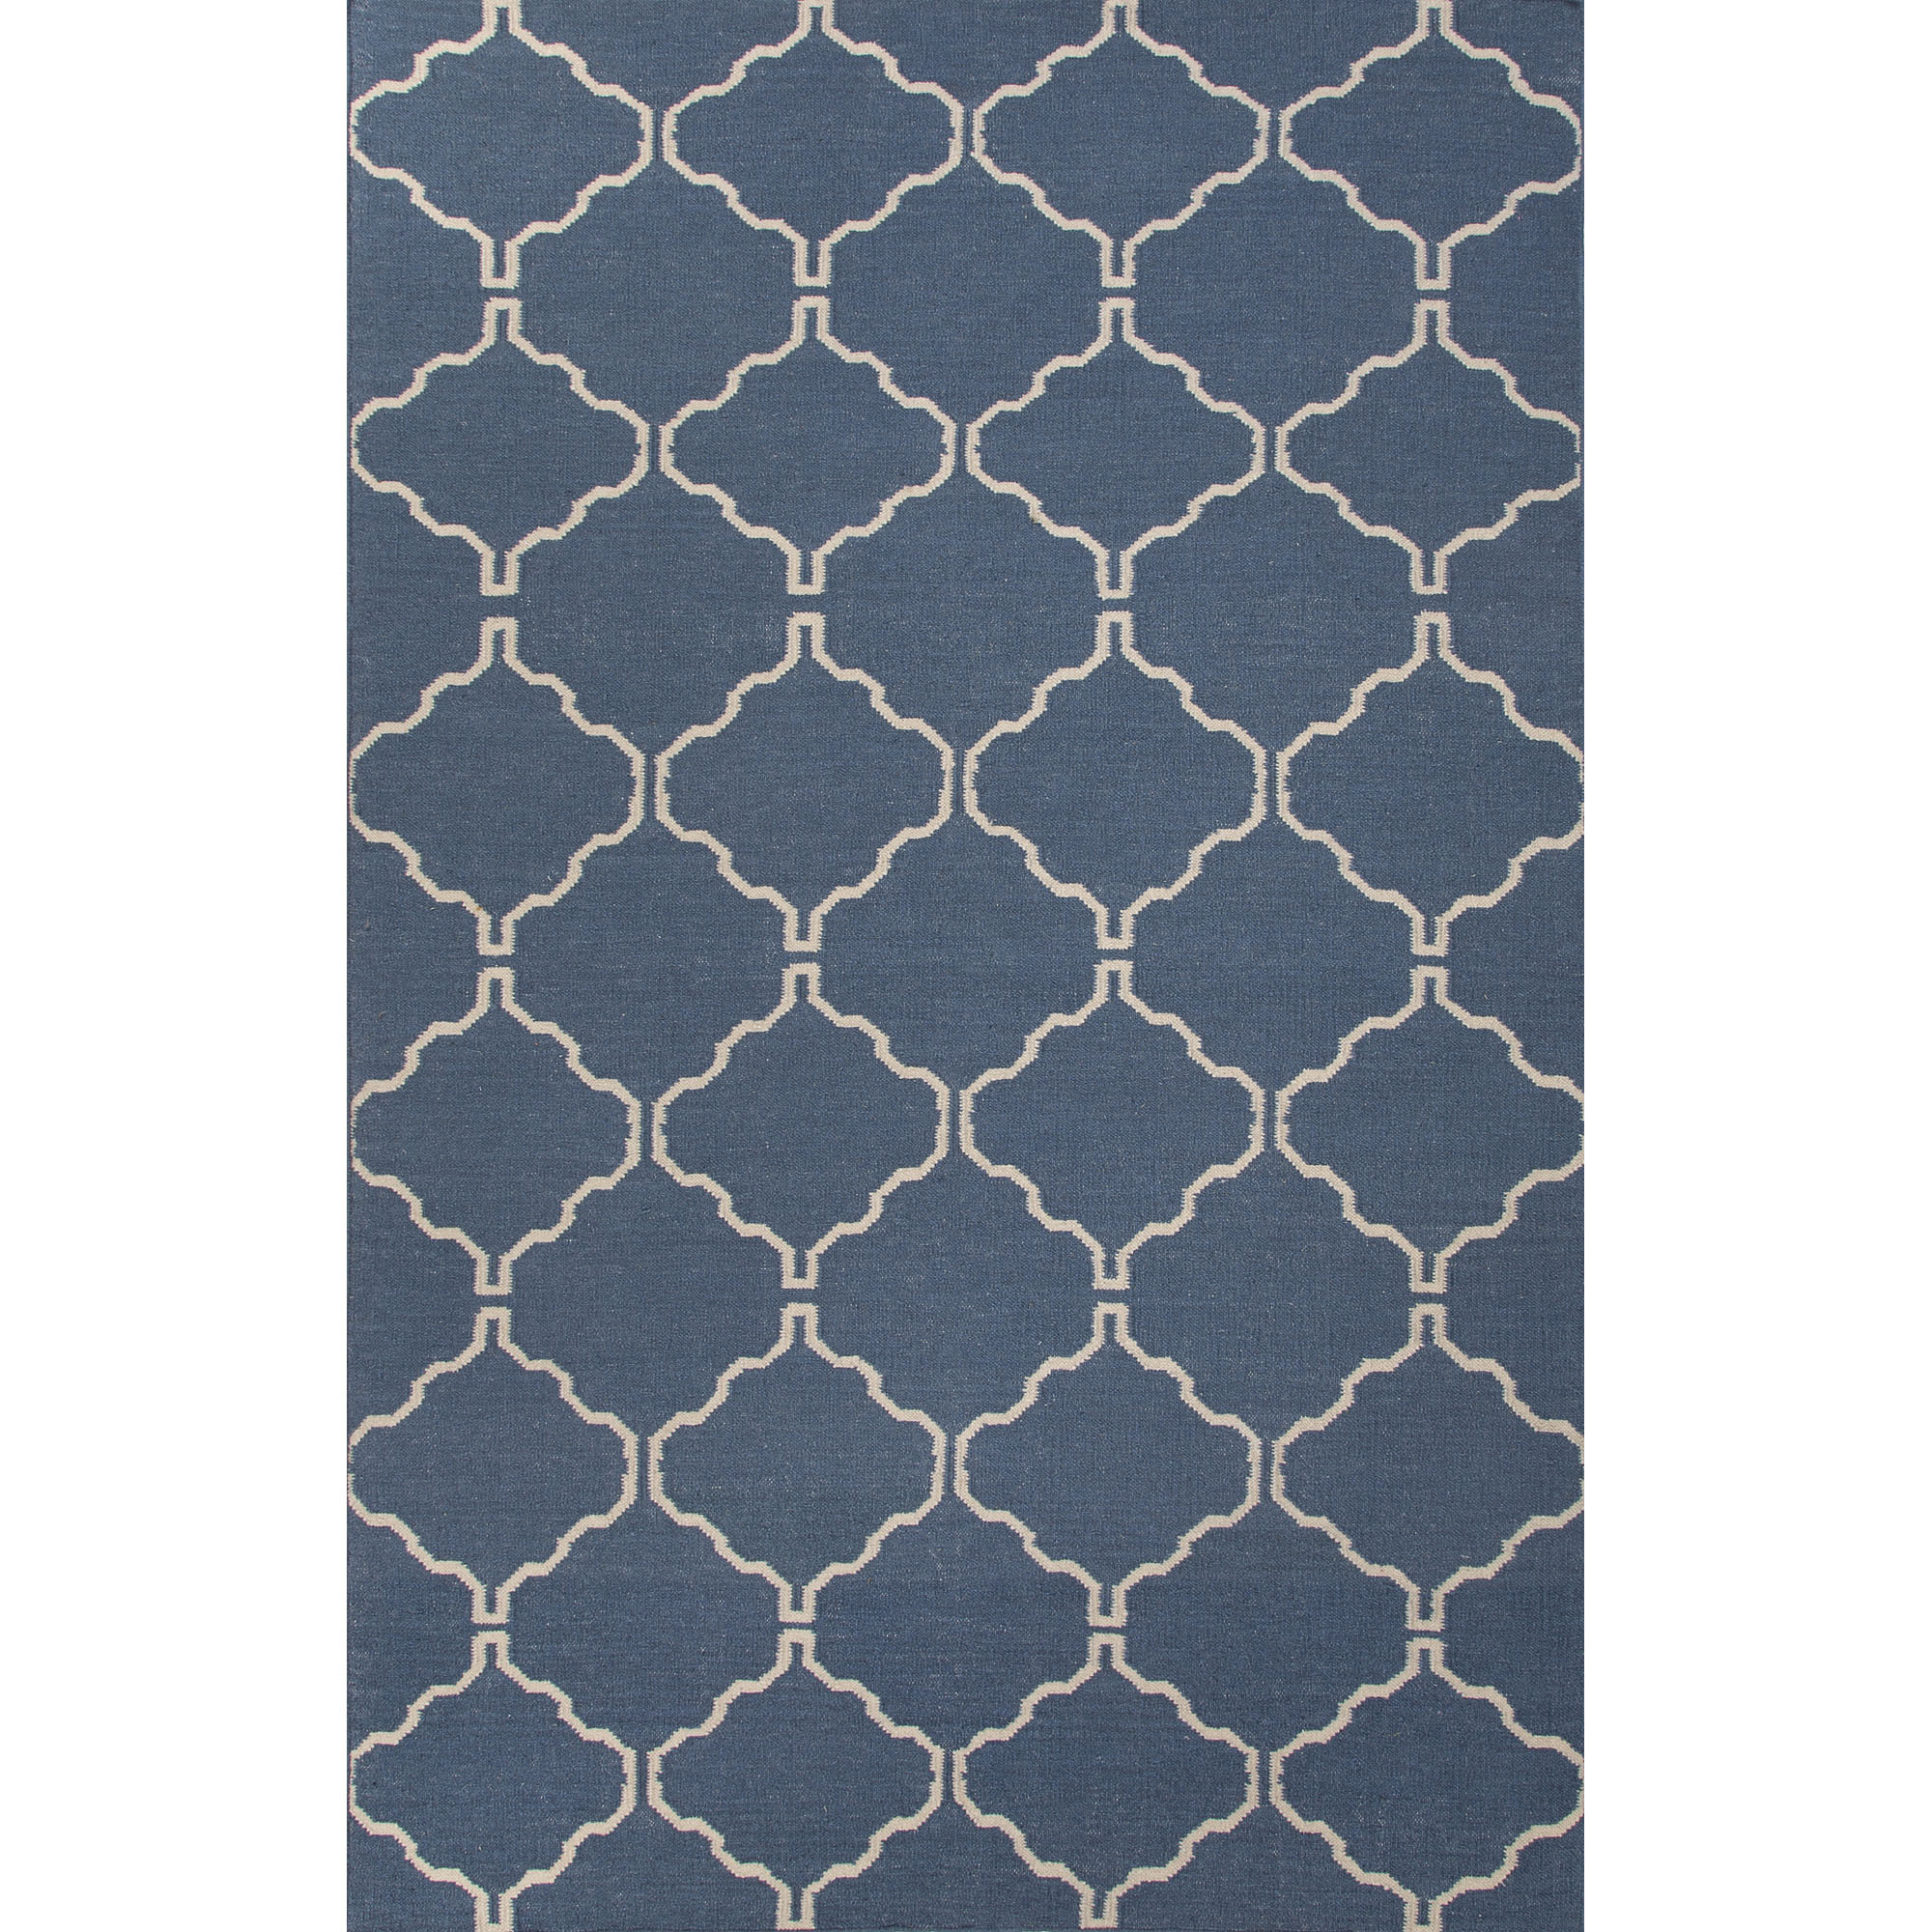 JAIPUR Rugs Maroc 8 x 10 Rug - Item Number: RUG112267